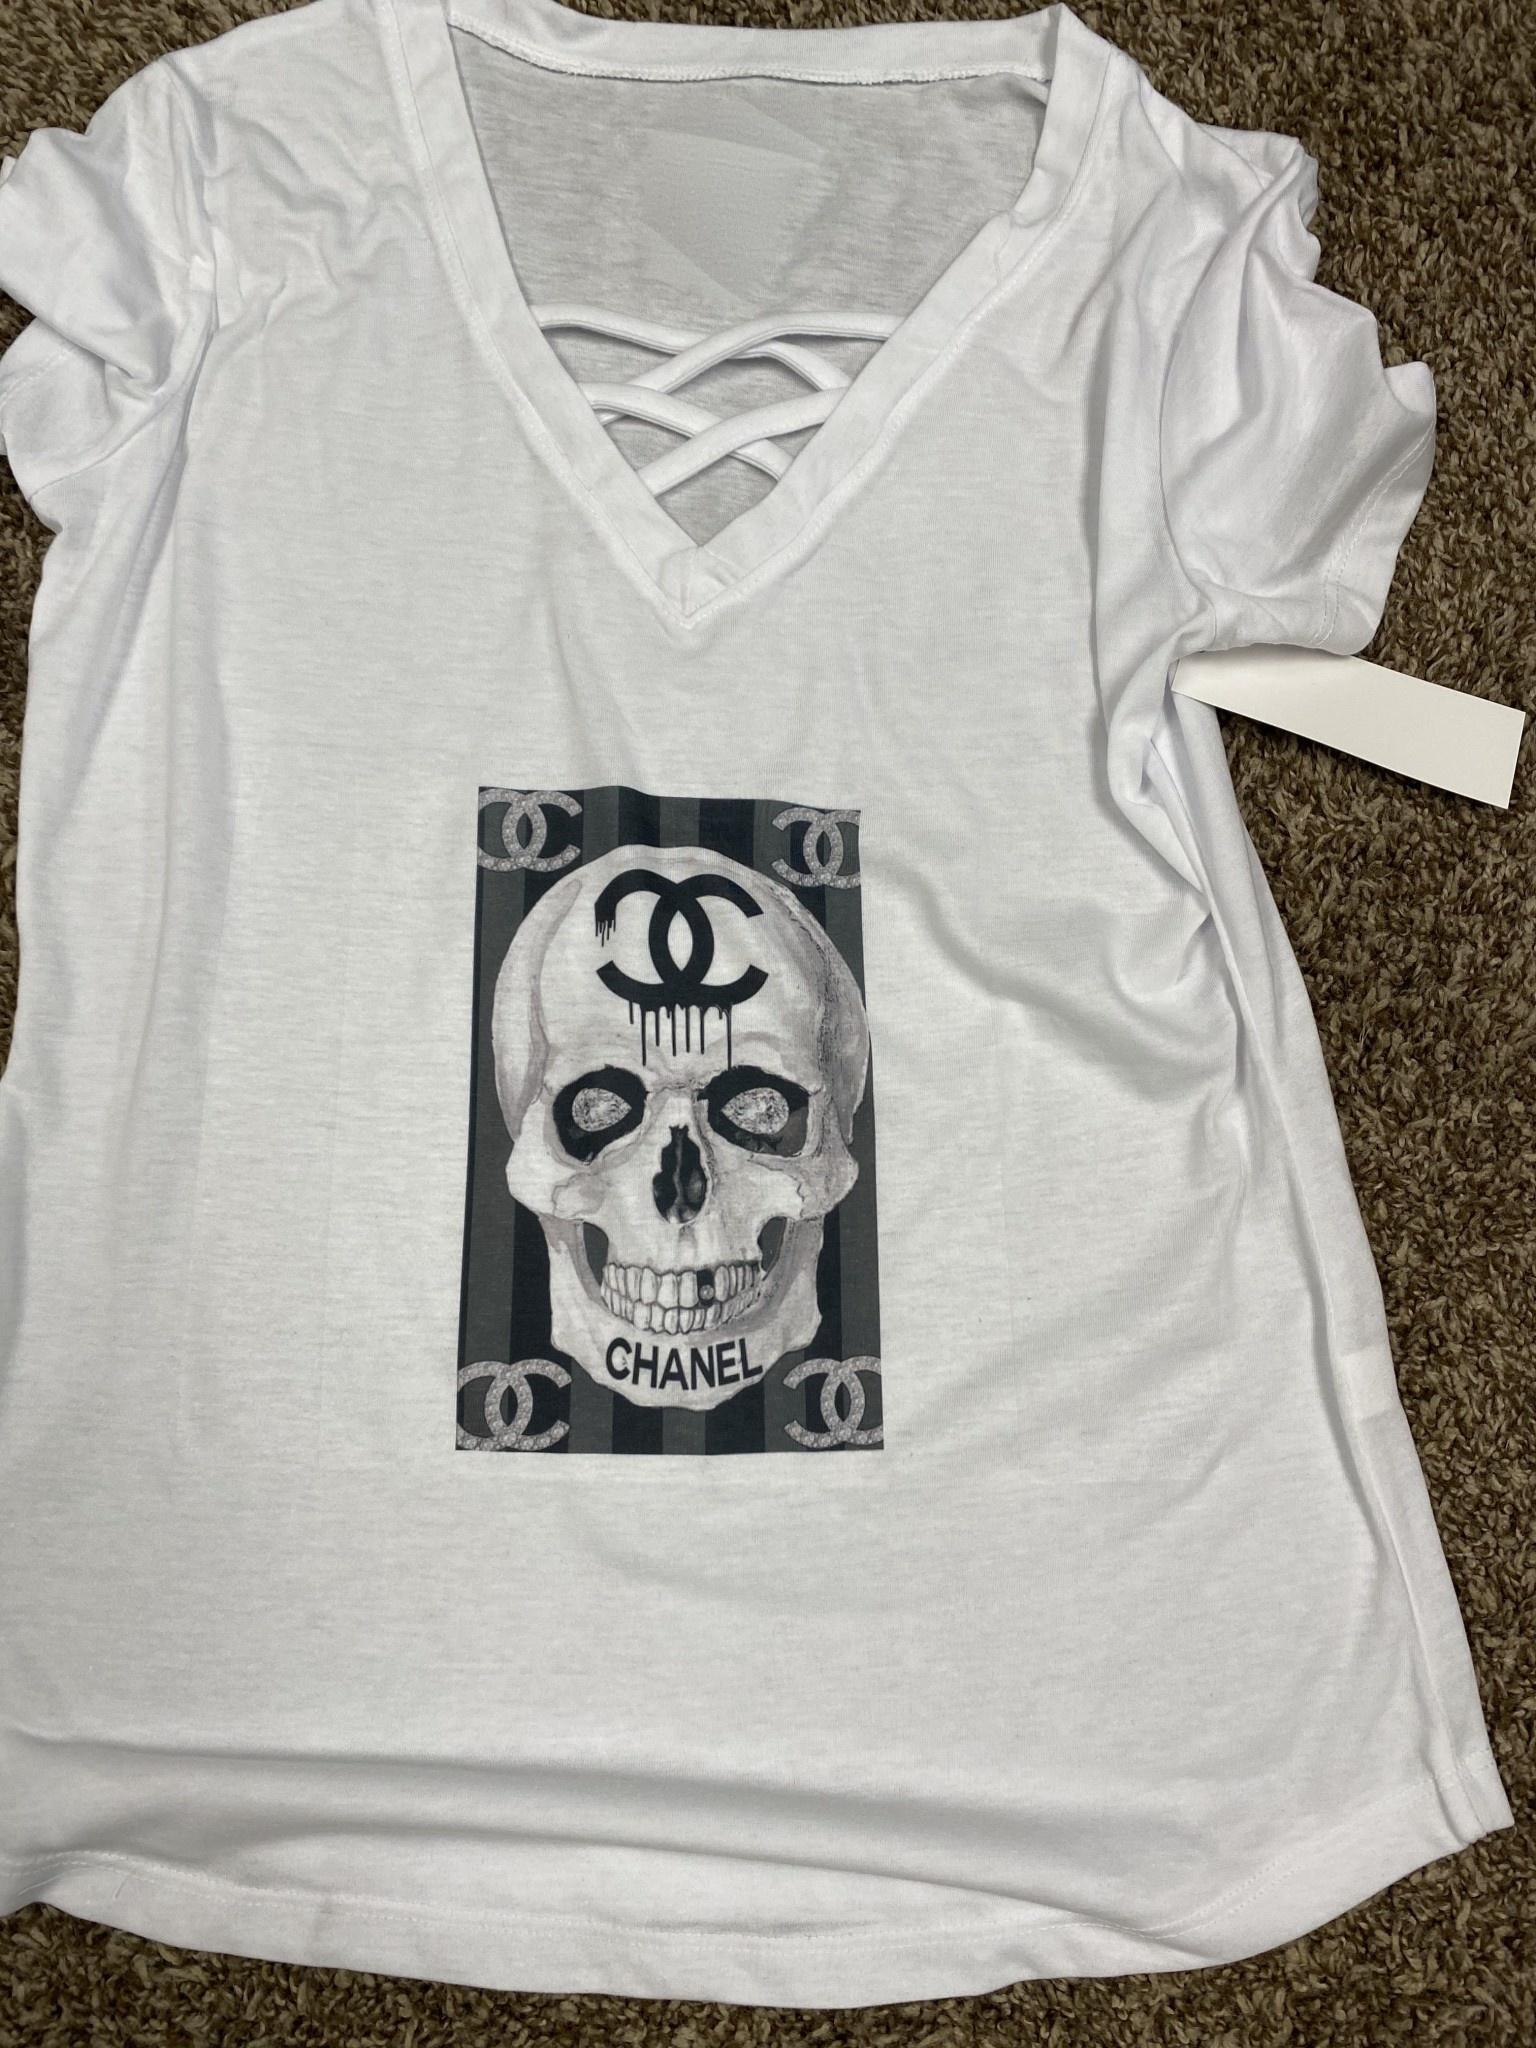 Designer Inspired Criss Cross Tee Shirts